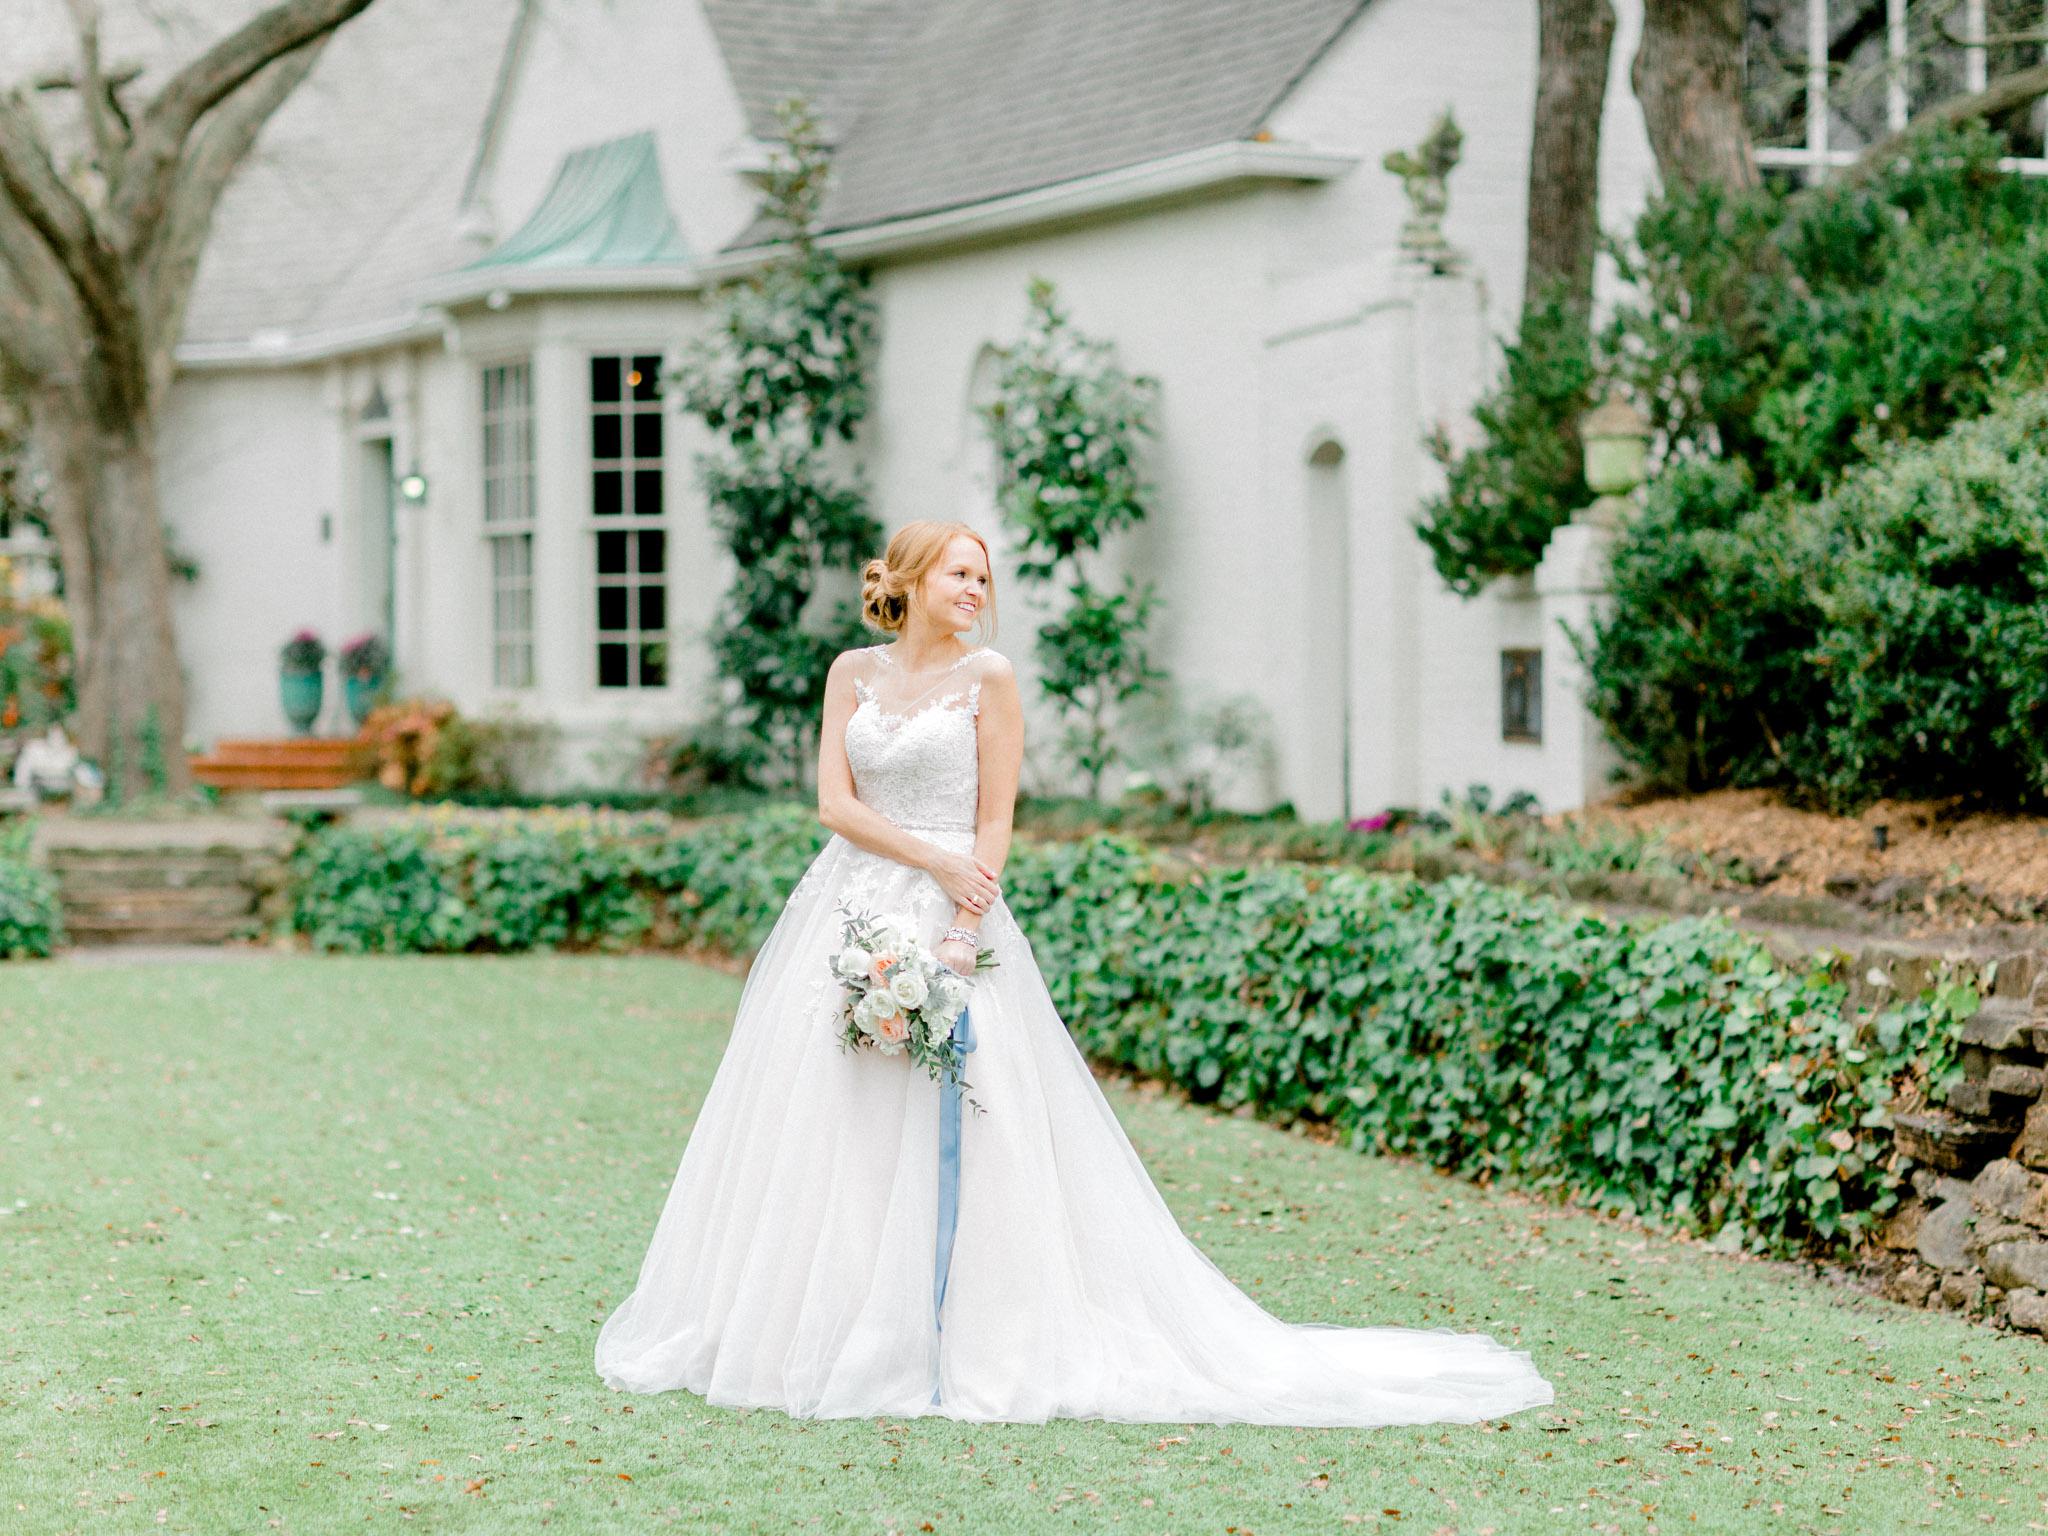 wichita-falls-wedding-photographer-6.jpg